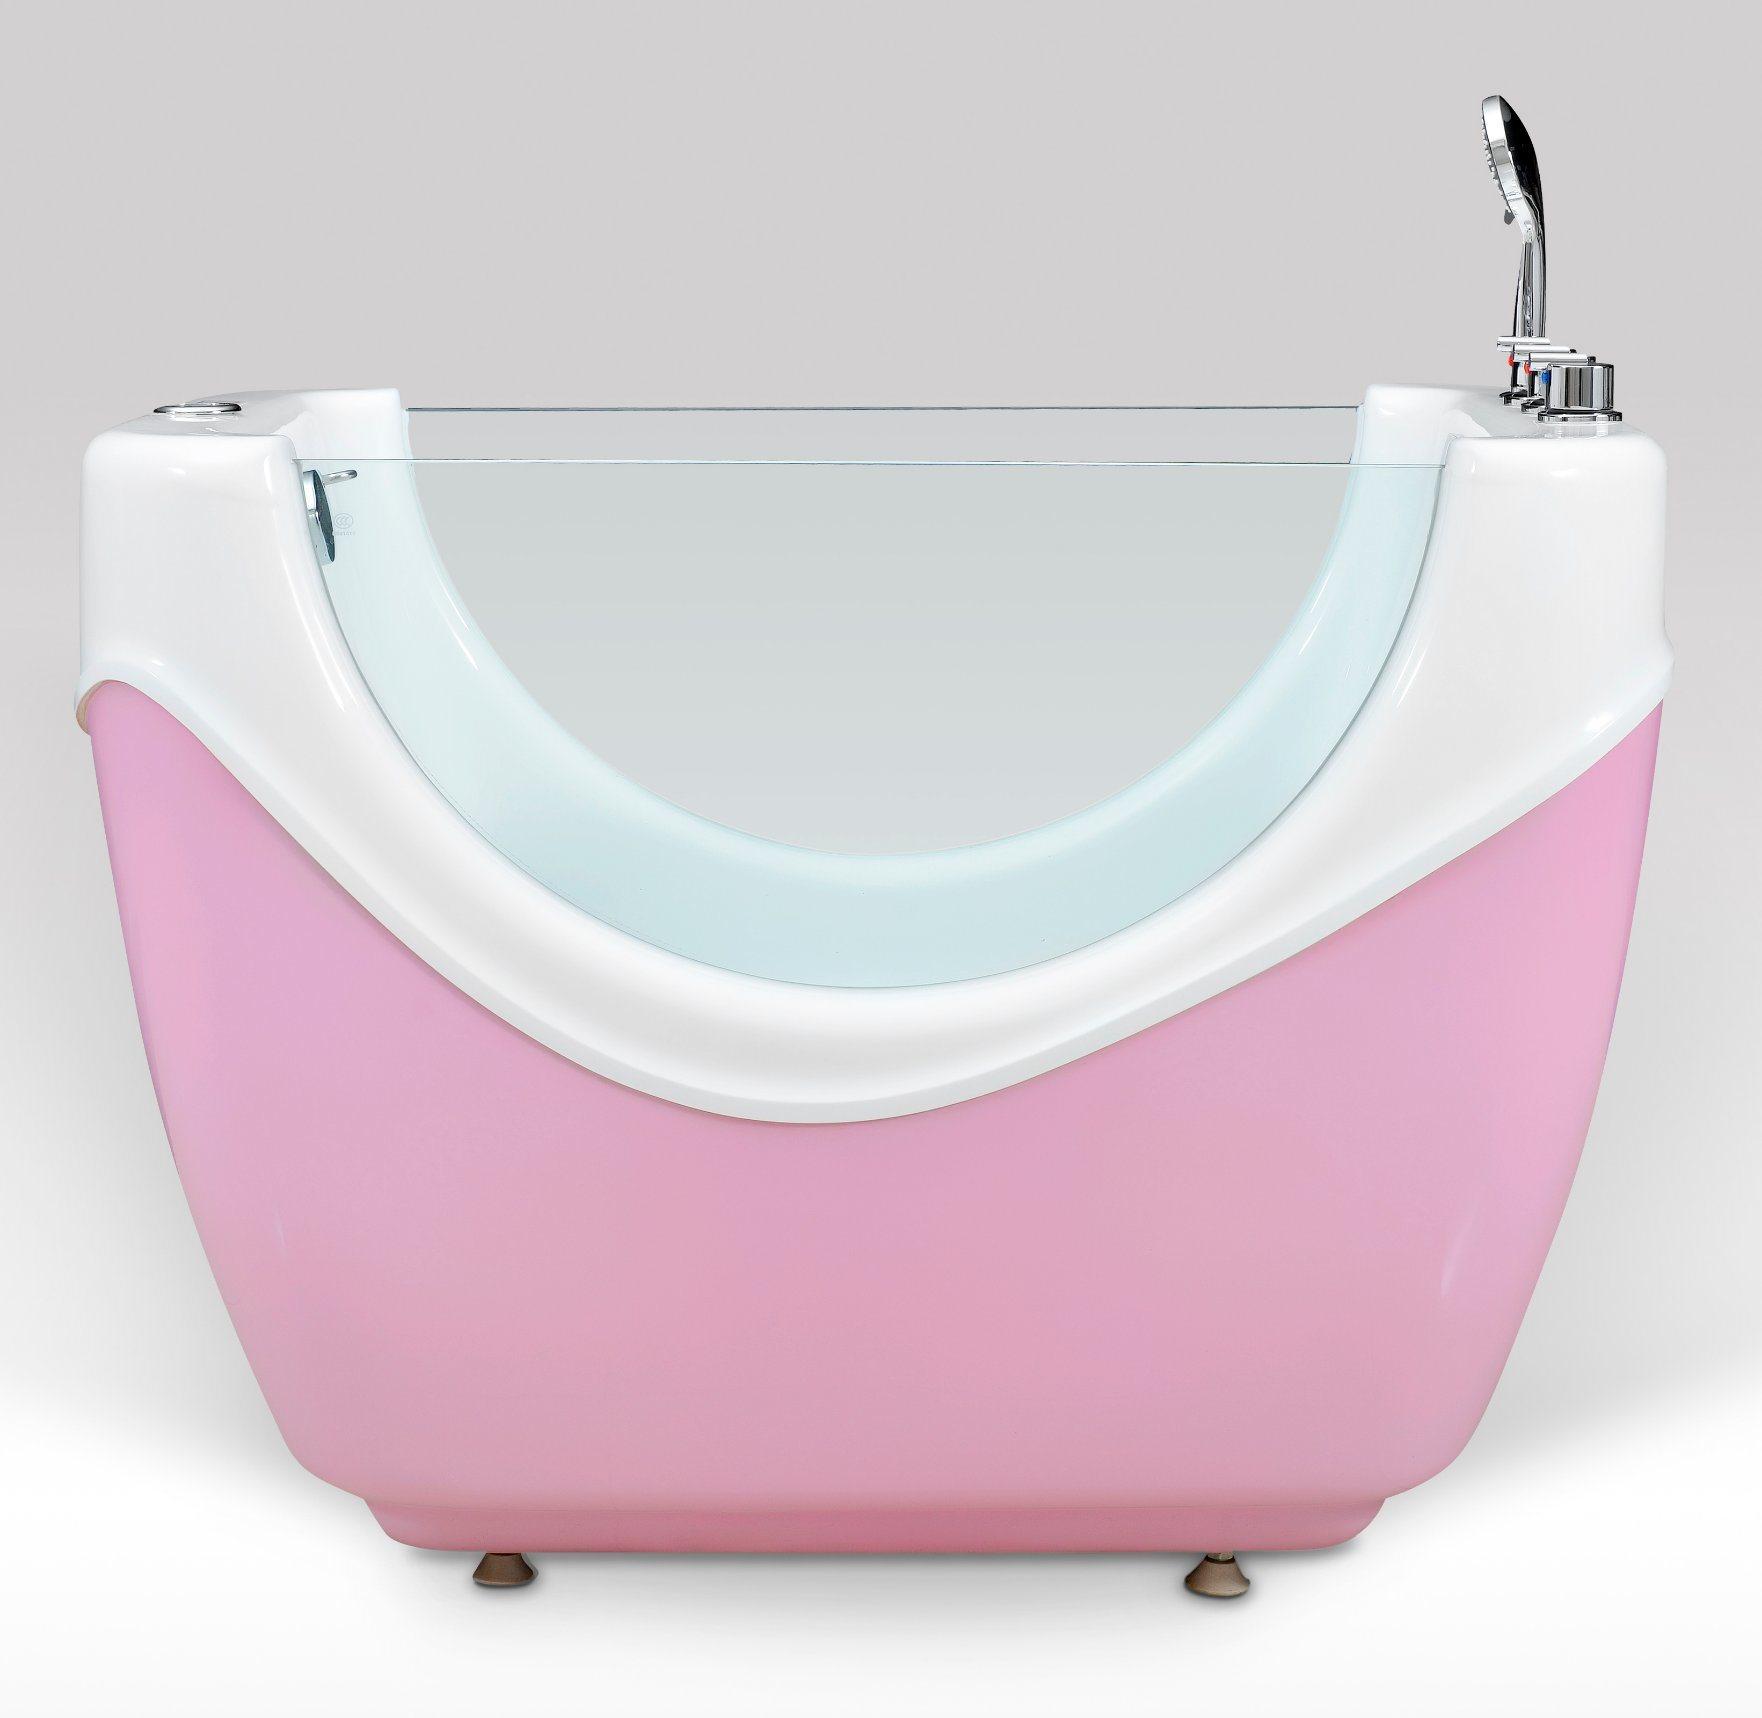 Pet Supply Dog Grooming Baths Sale Hydro Bath SPA Dog Bathtub Fiberglass Tub,  Pet Products